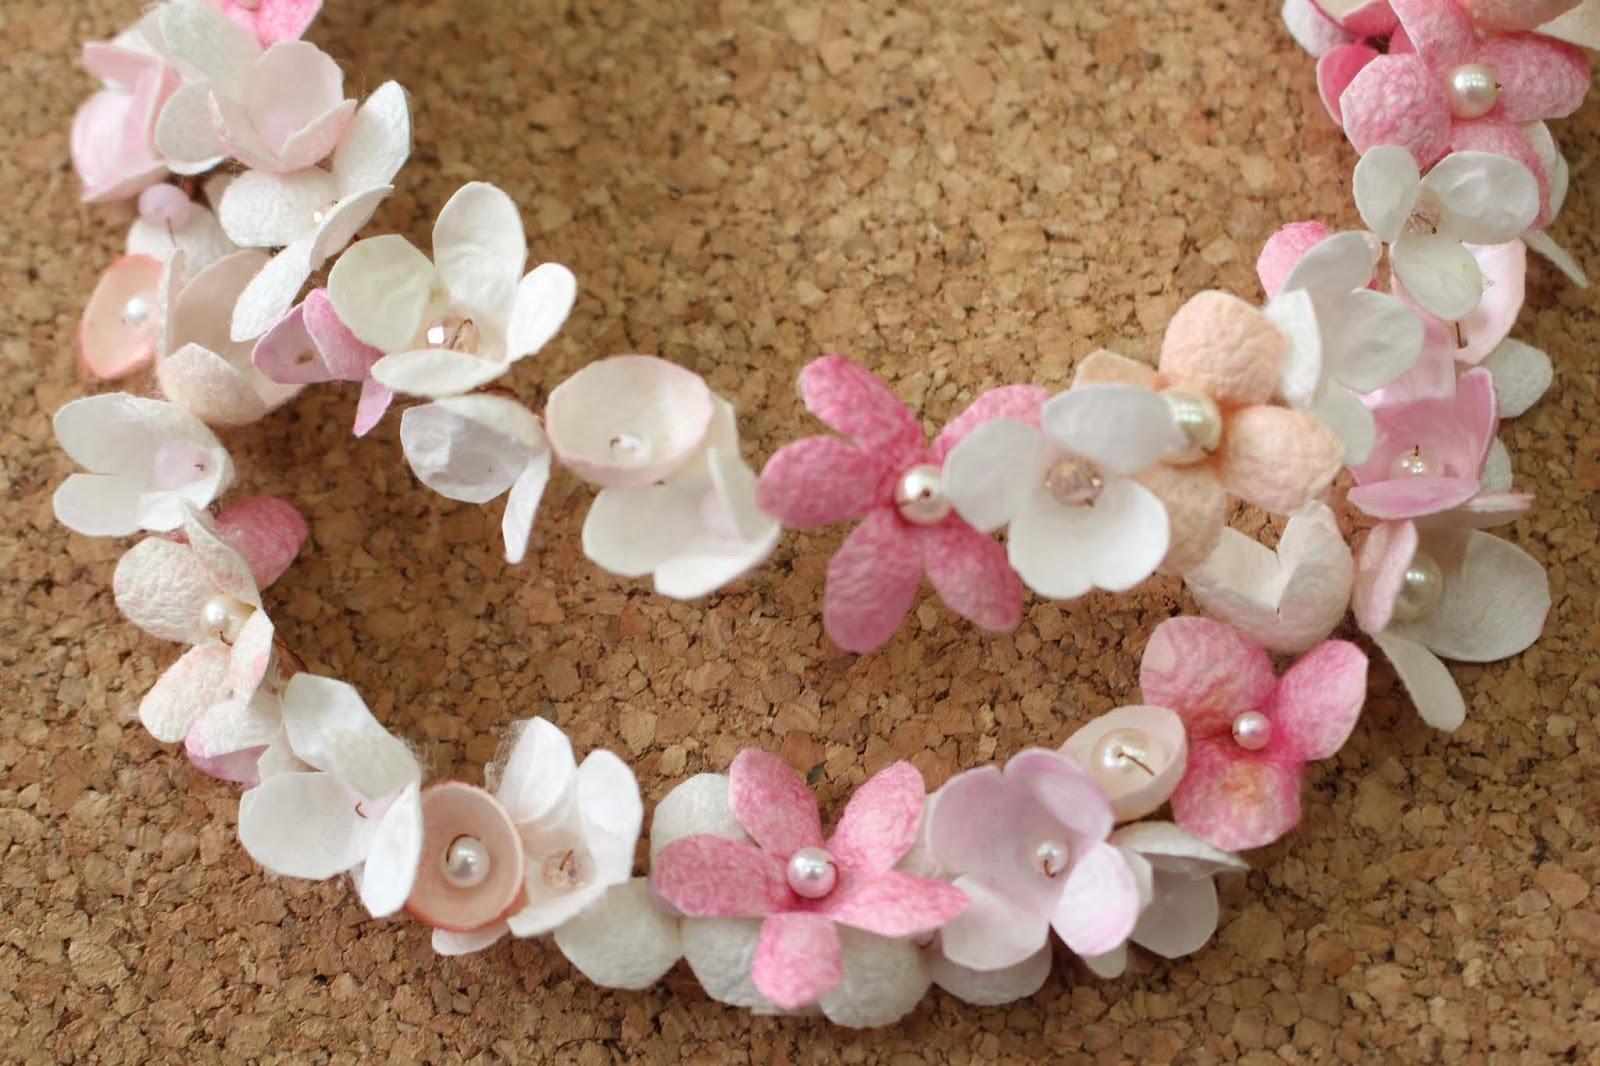 e96521575d8 Στεφανάκια για στολισμό κεφαλιού για παρανυφάκια, για τη νύφη ή το μωράκι  μας στη βάπτισή του.. εδώ σε υπέροχες αποχρώσεις παλ ροζ, ιβουάρ, σομόν!